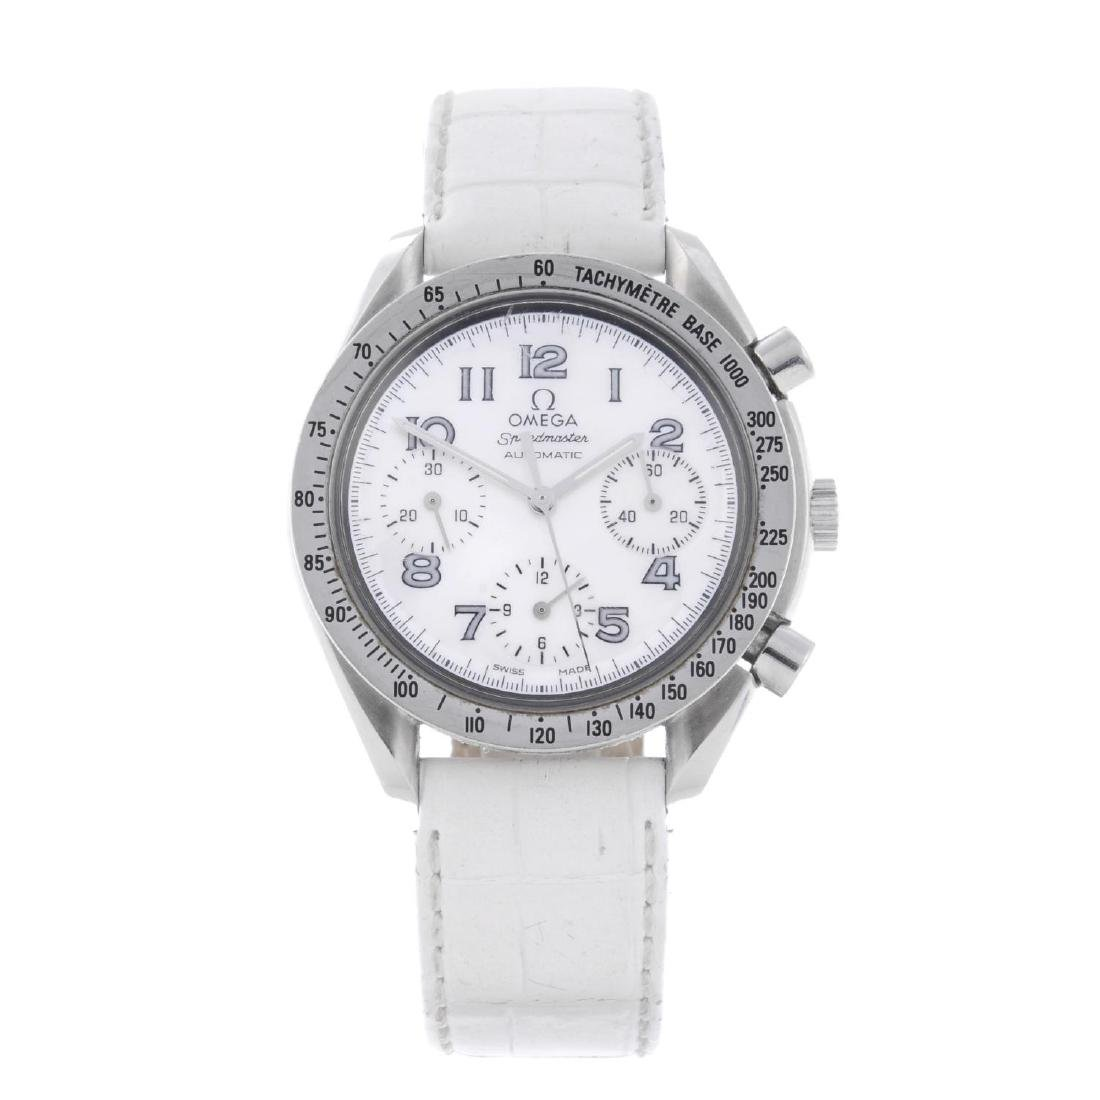 OMEGA - a lady's Speedmaster chronograph wrist watch.